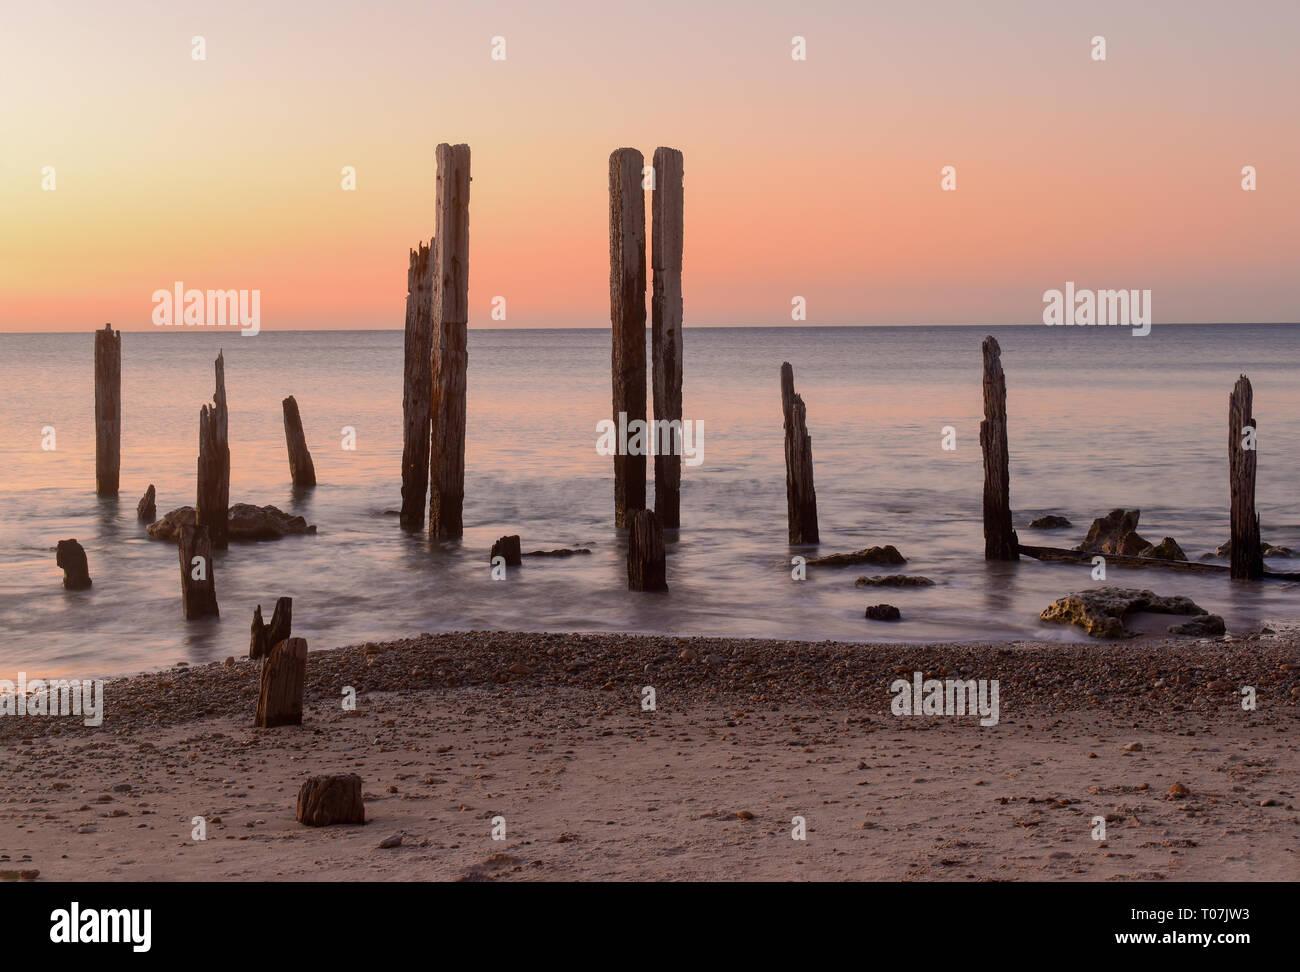 Port Willunga in South Australia at sunset - Stock Image